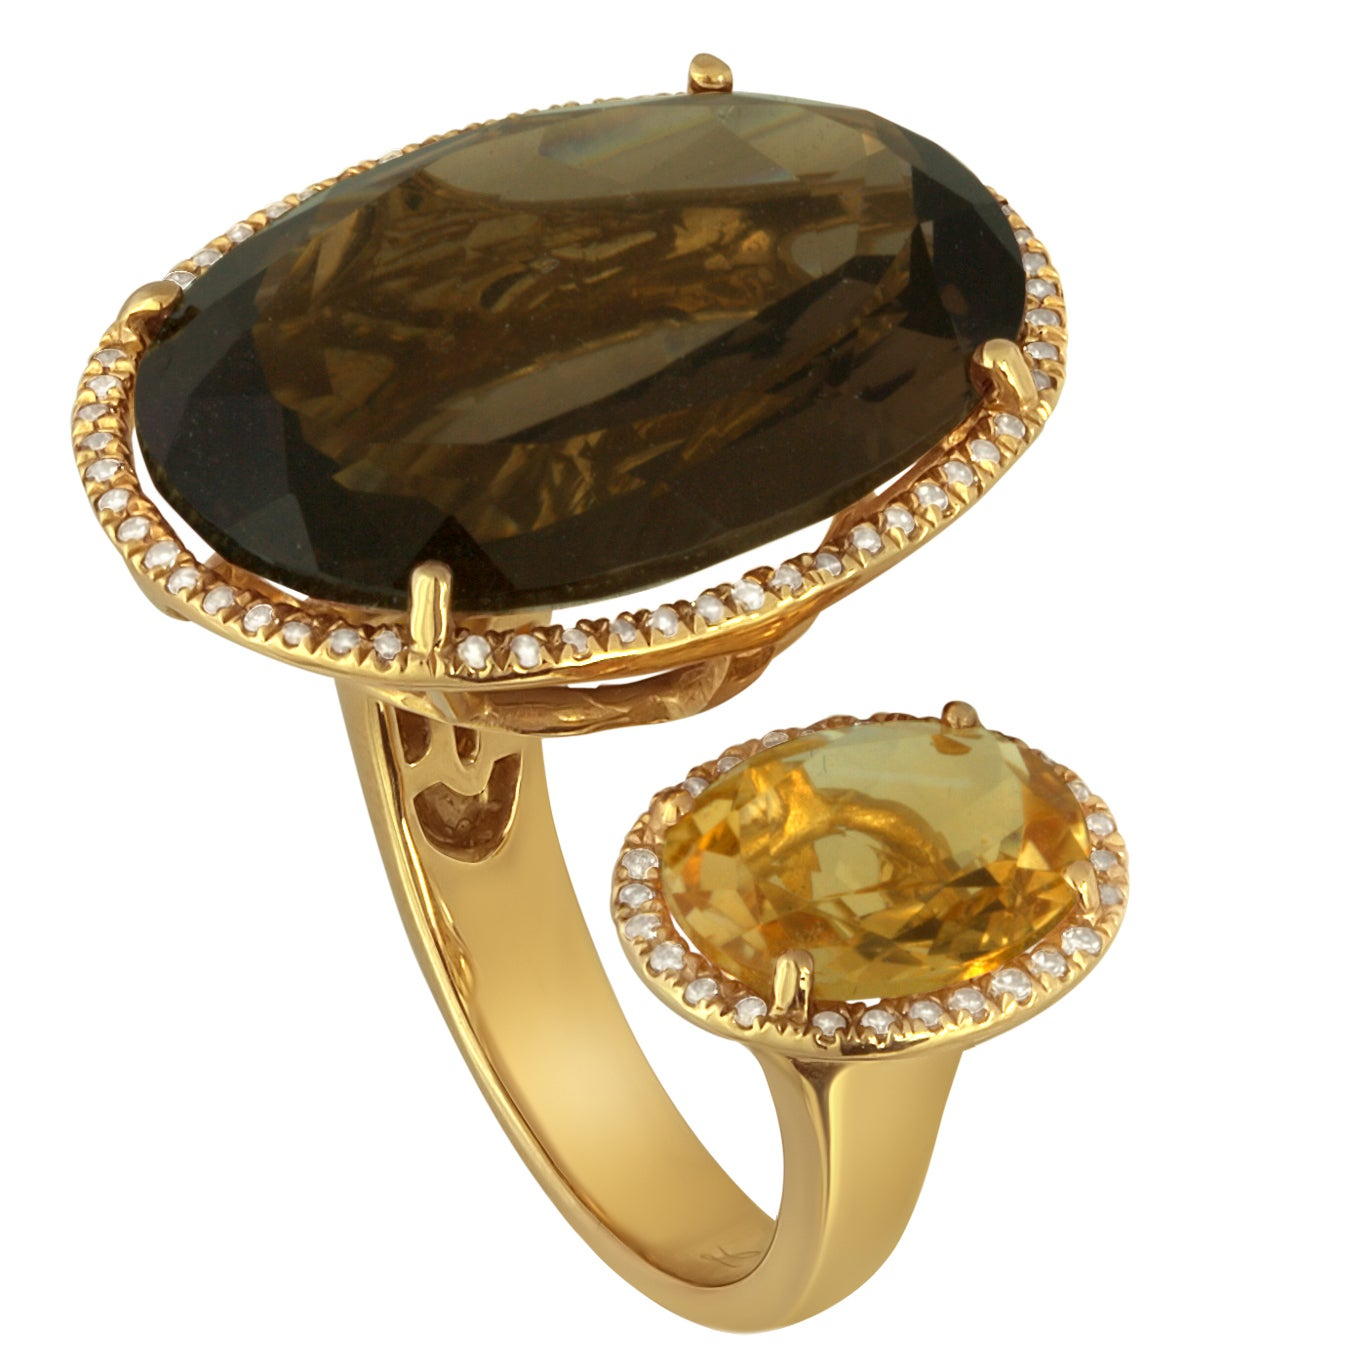 19.75 Carats Smoky Quartz and Citrine Diamonds Gold Ring